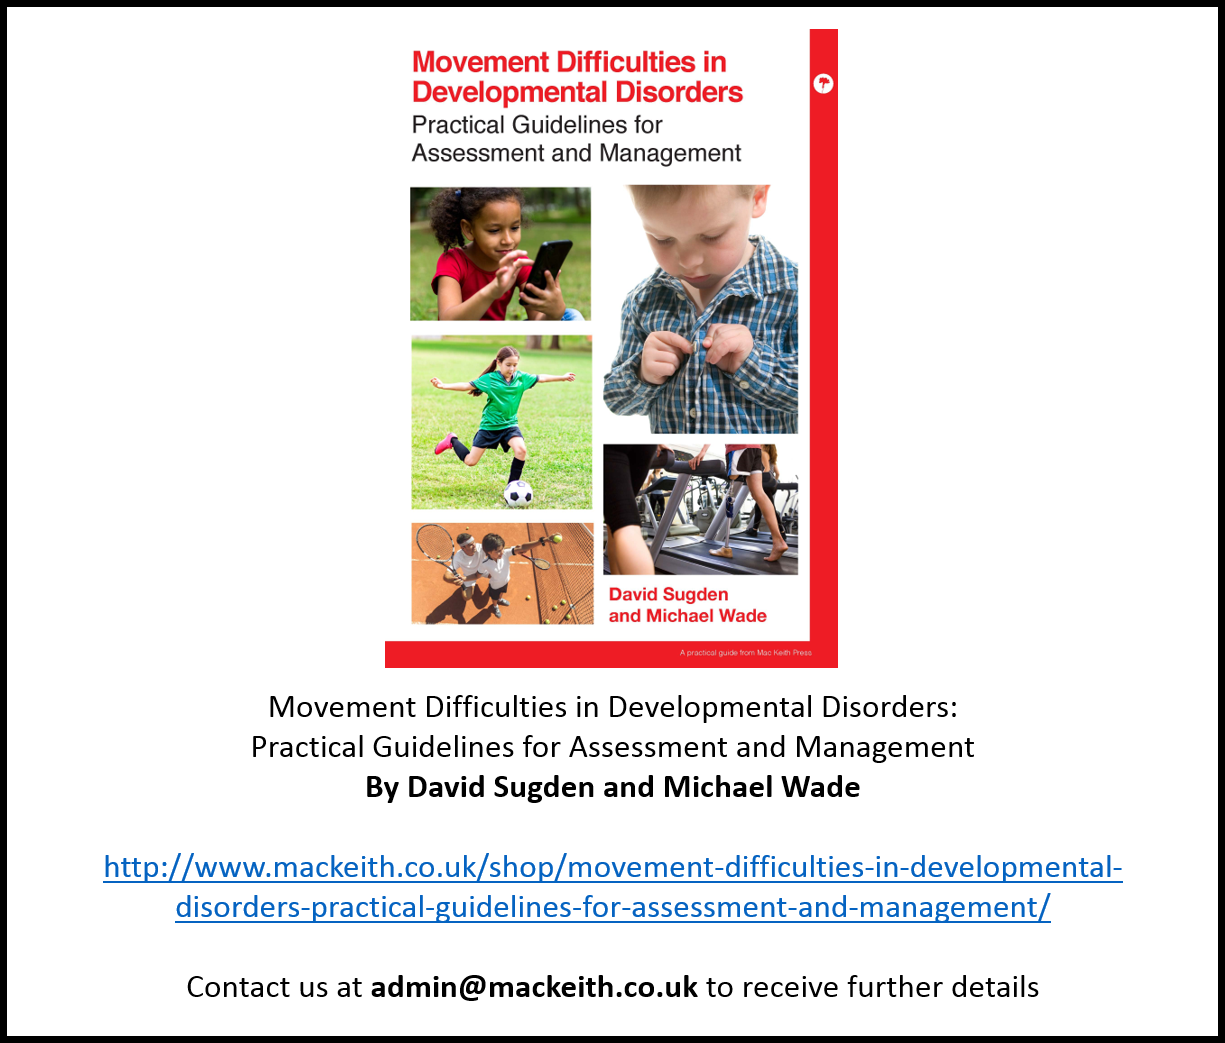 Movement Difficulties in Developmental Disorders